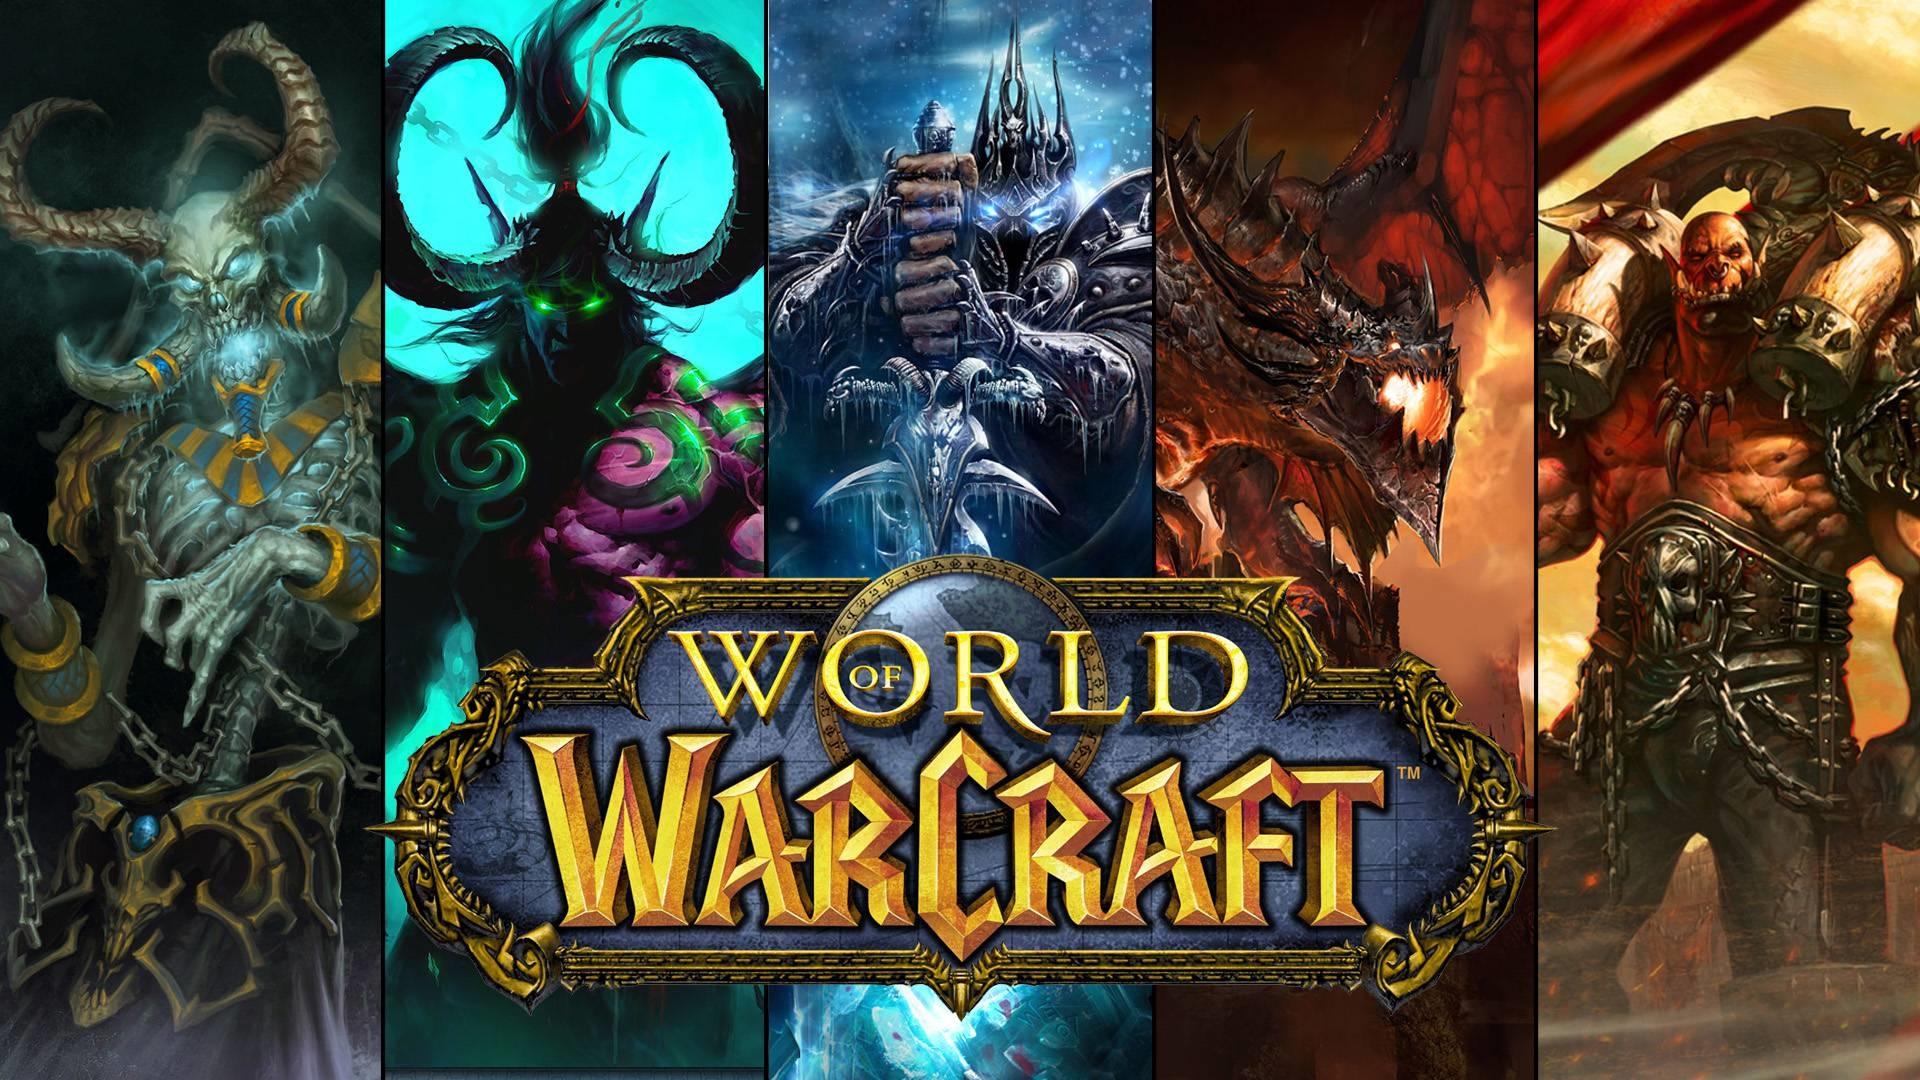 World of warcraft cataclysm orc speach porn videos